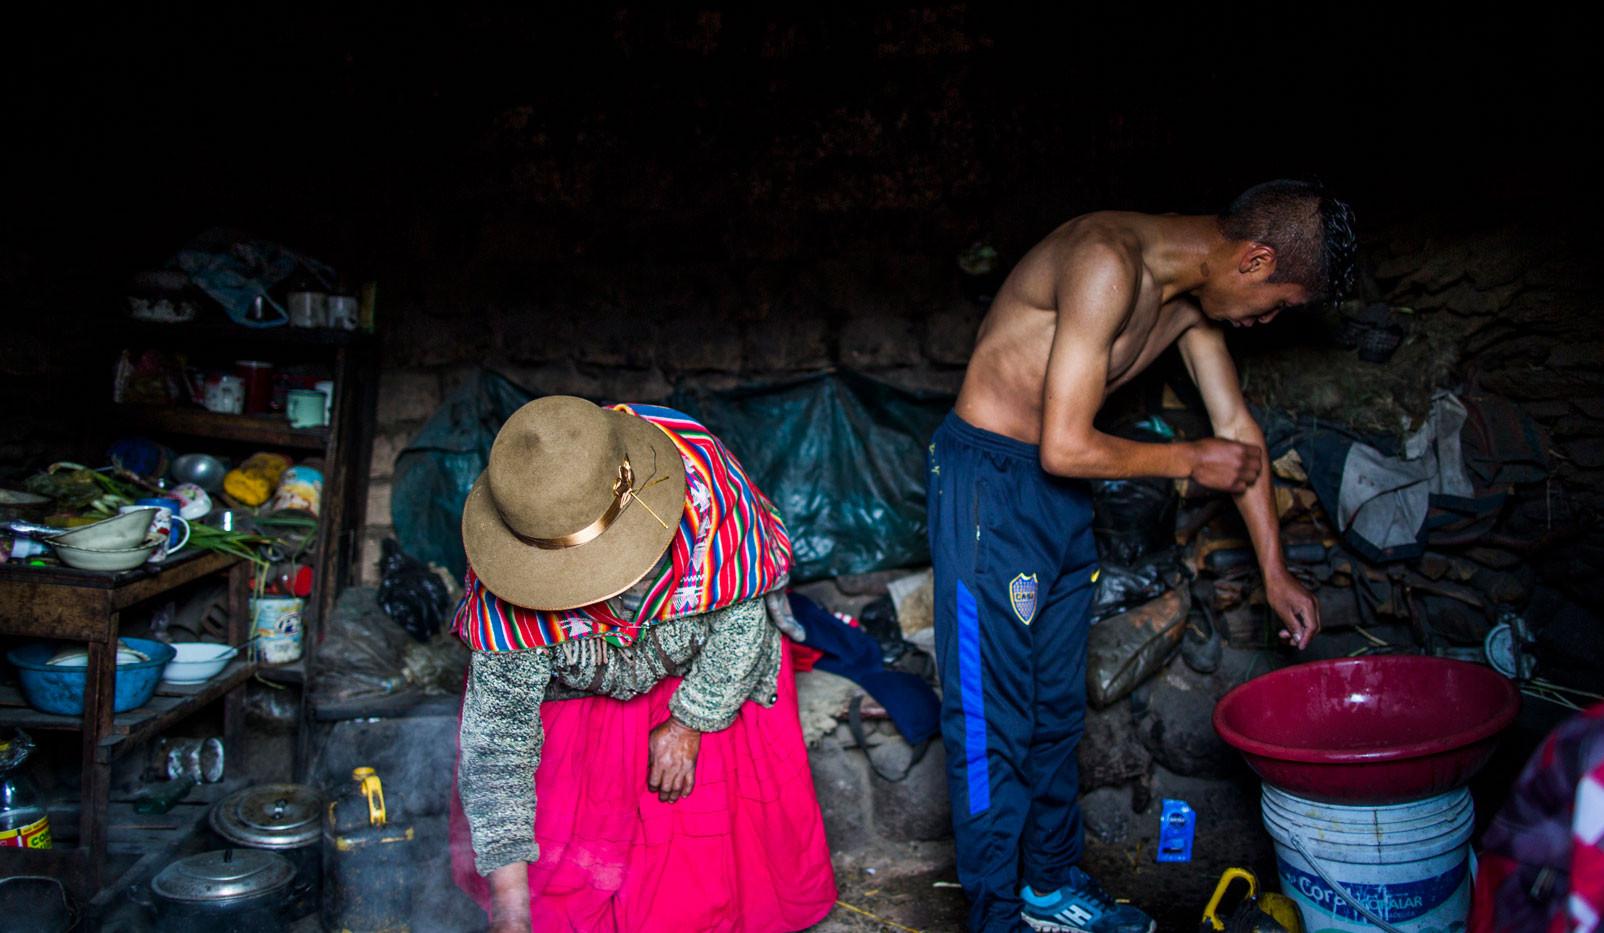 181116_MHP_Bolivia_1793.jpg